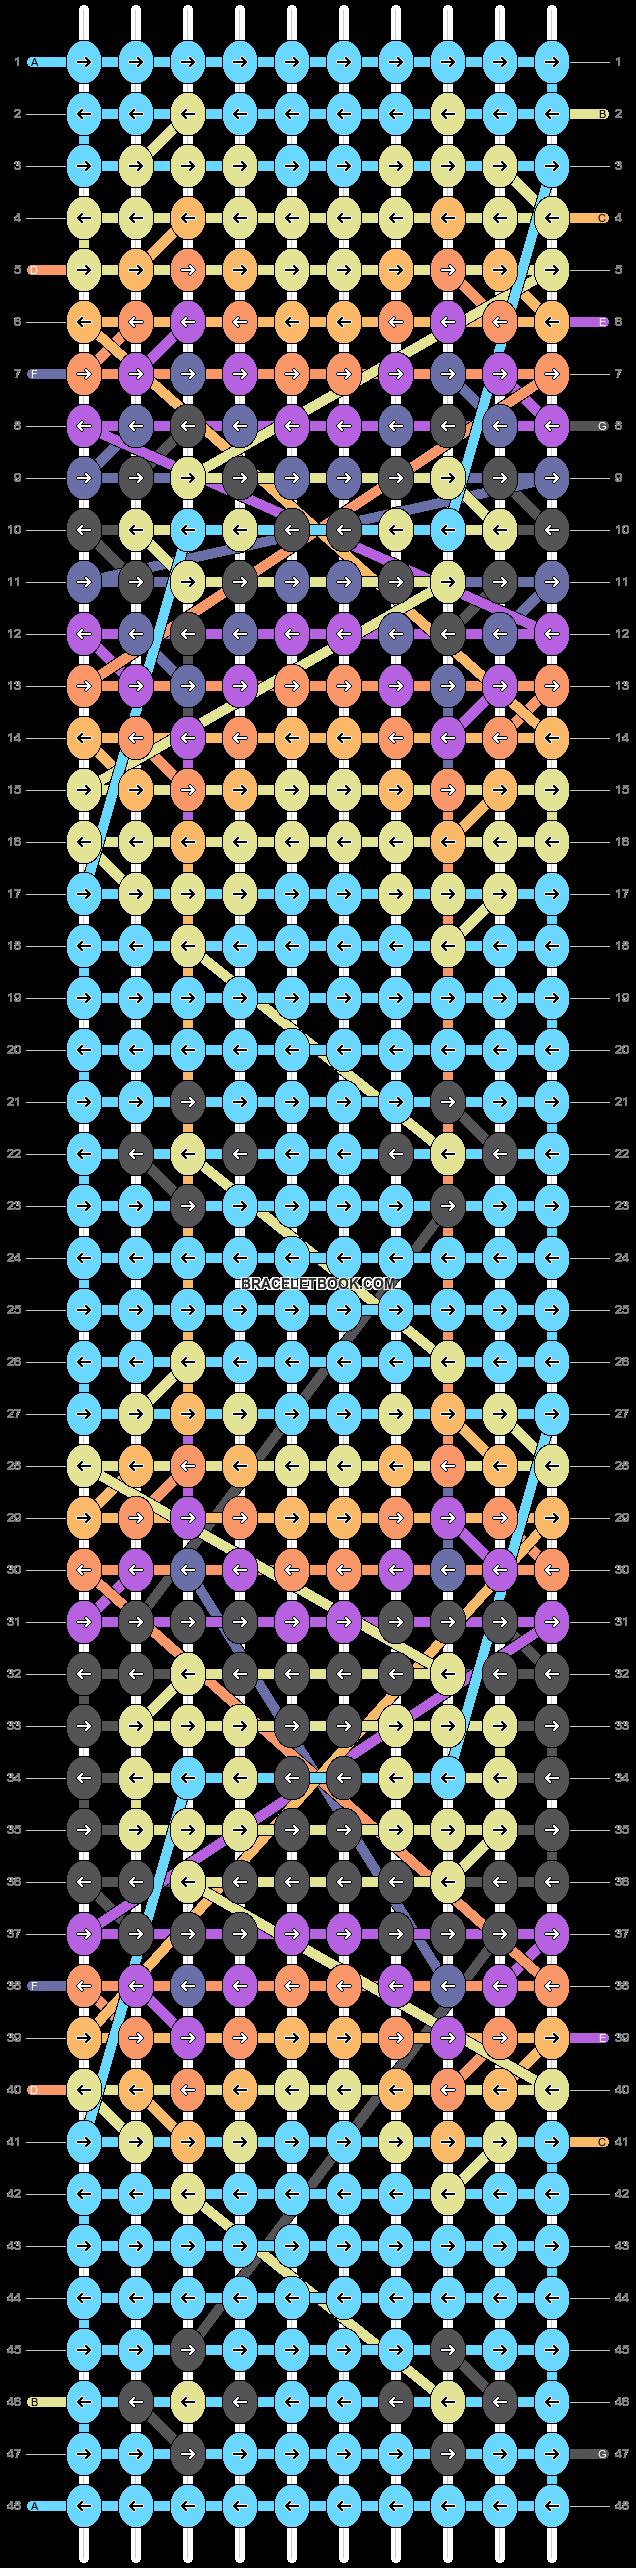 Alpha pattern #88648 variation #162800 pattern